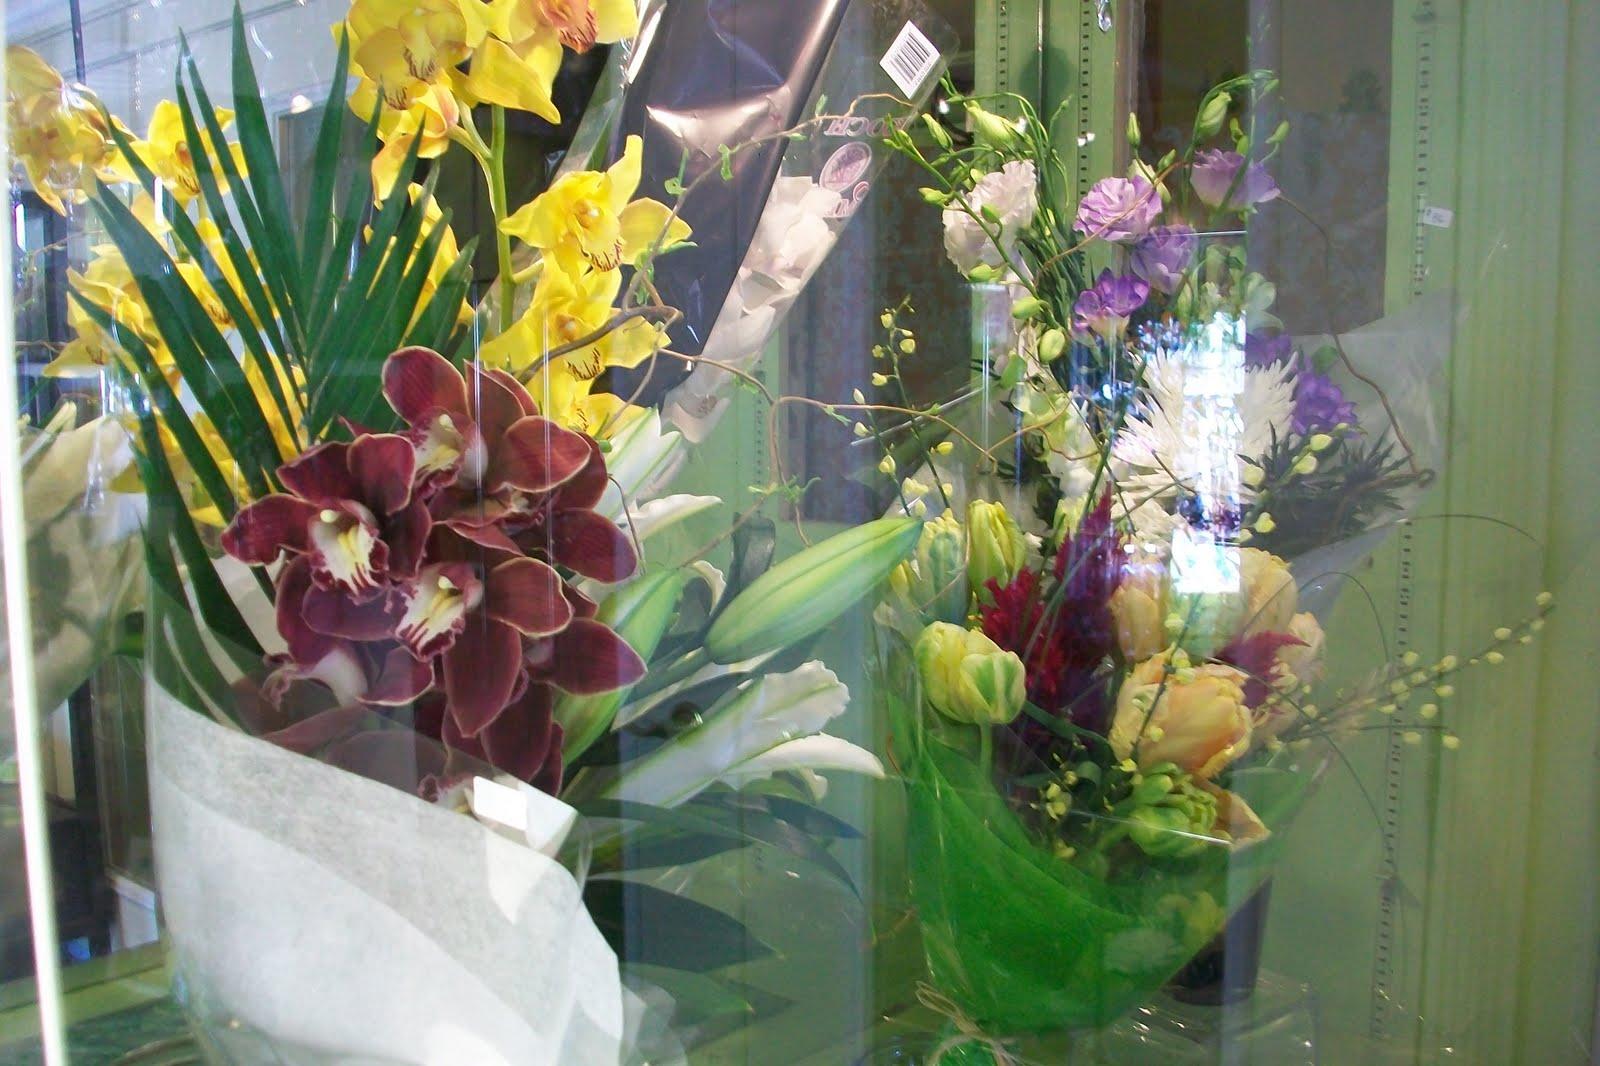 Flower baskets calgary spring flower basket grower direct in flower baskets calgary from nature to home marlow floralworks calgary alberta izmirmasajfo